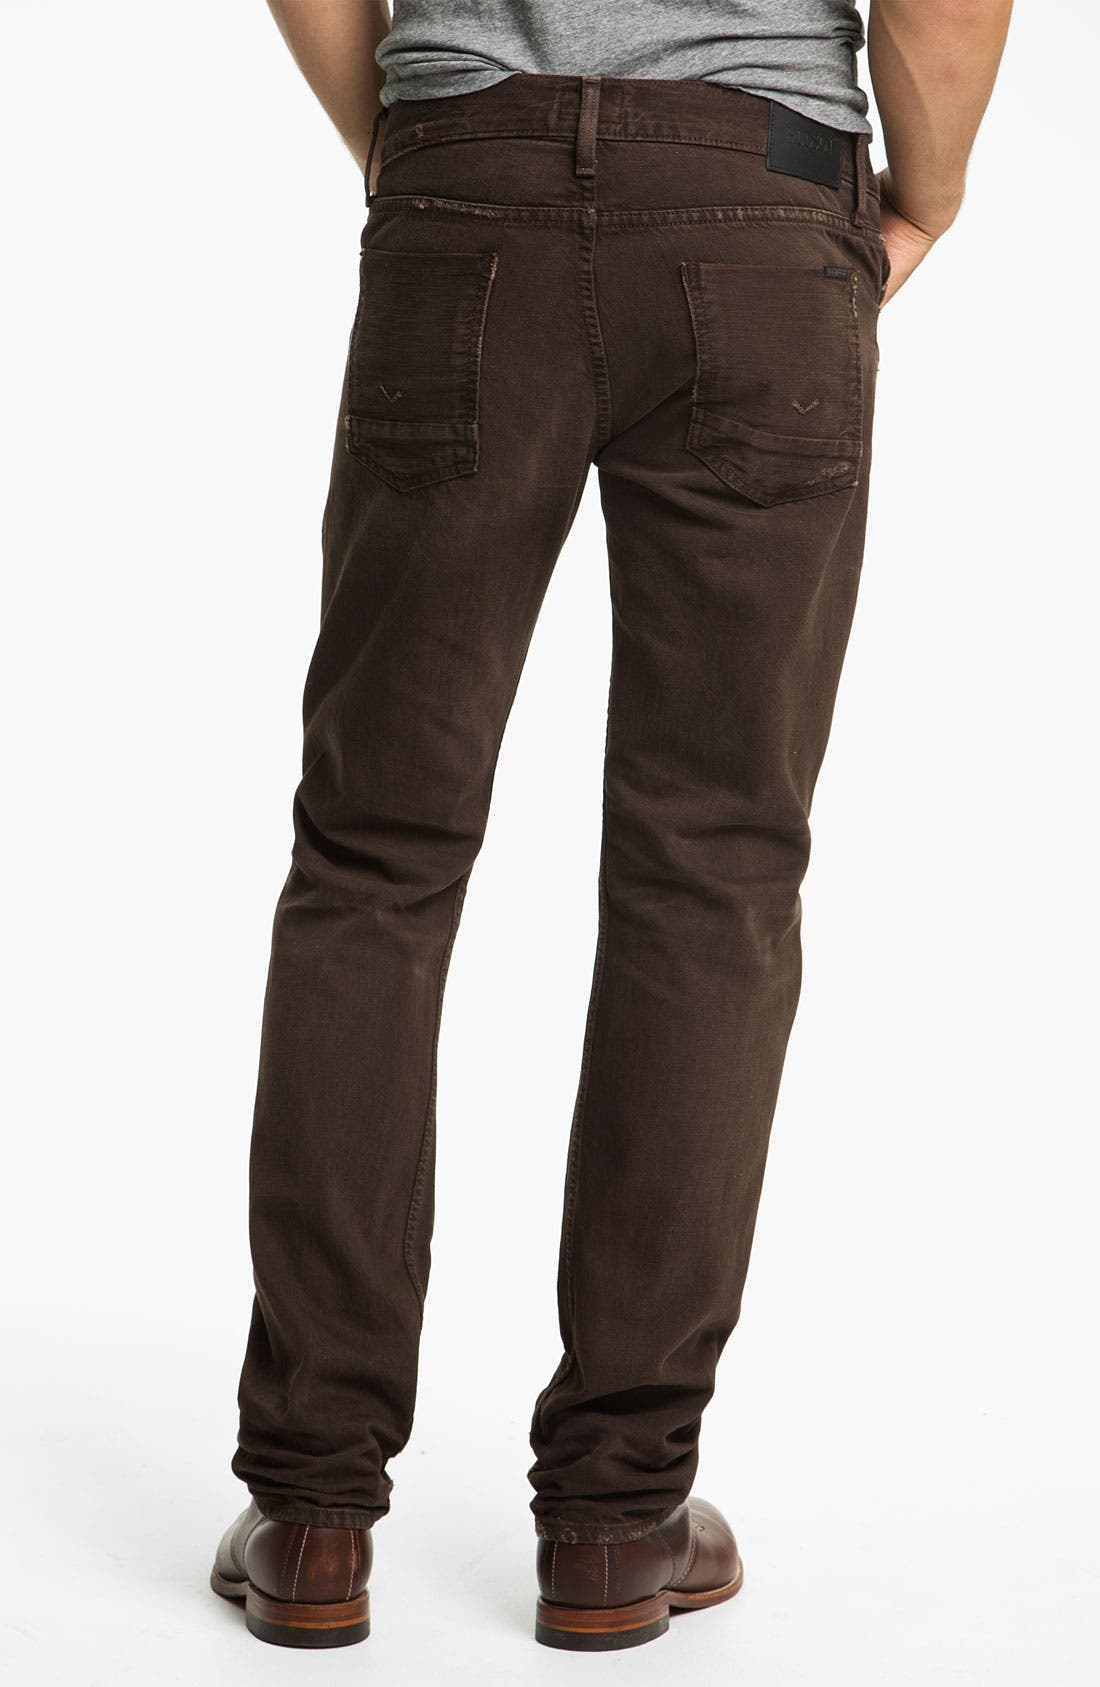 Main Image - Hudson Jeans 'Byron' Selvedge Jeans (Russet)